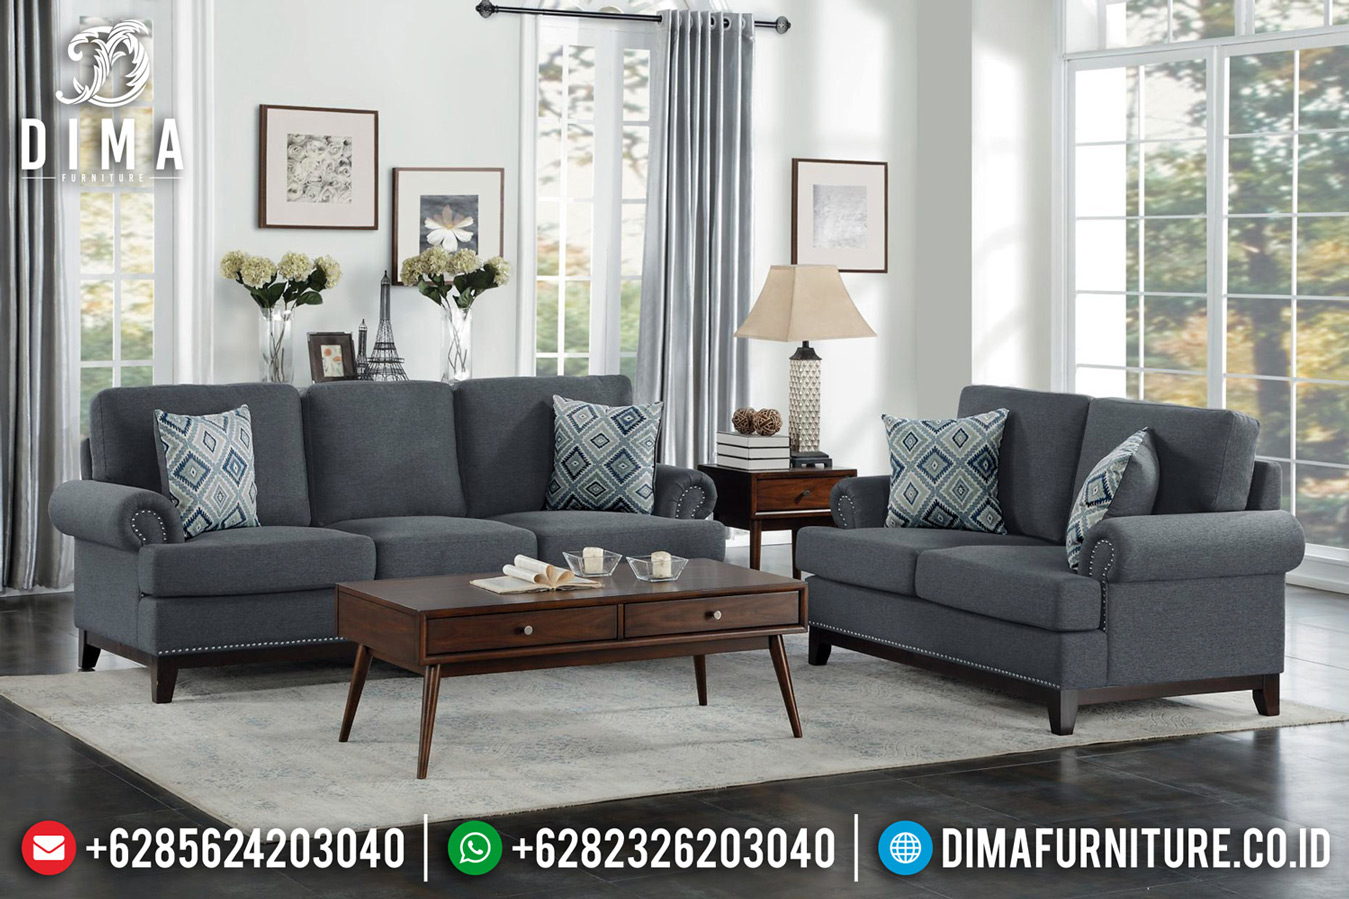 Desain Ruang Tamu Kekinian New Sofa Tamu Minimalis Classic Retro French Style TTJ-0635